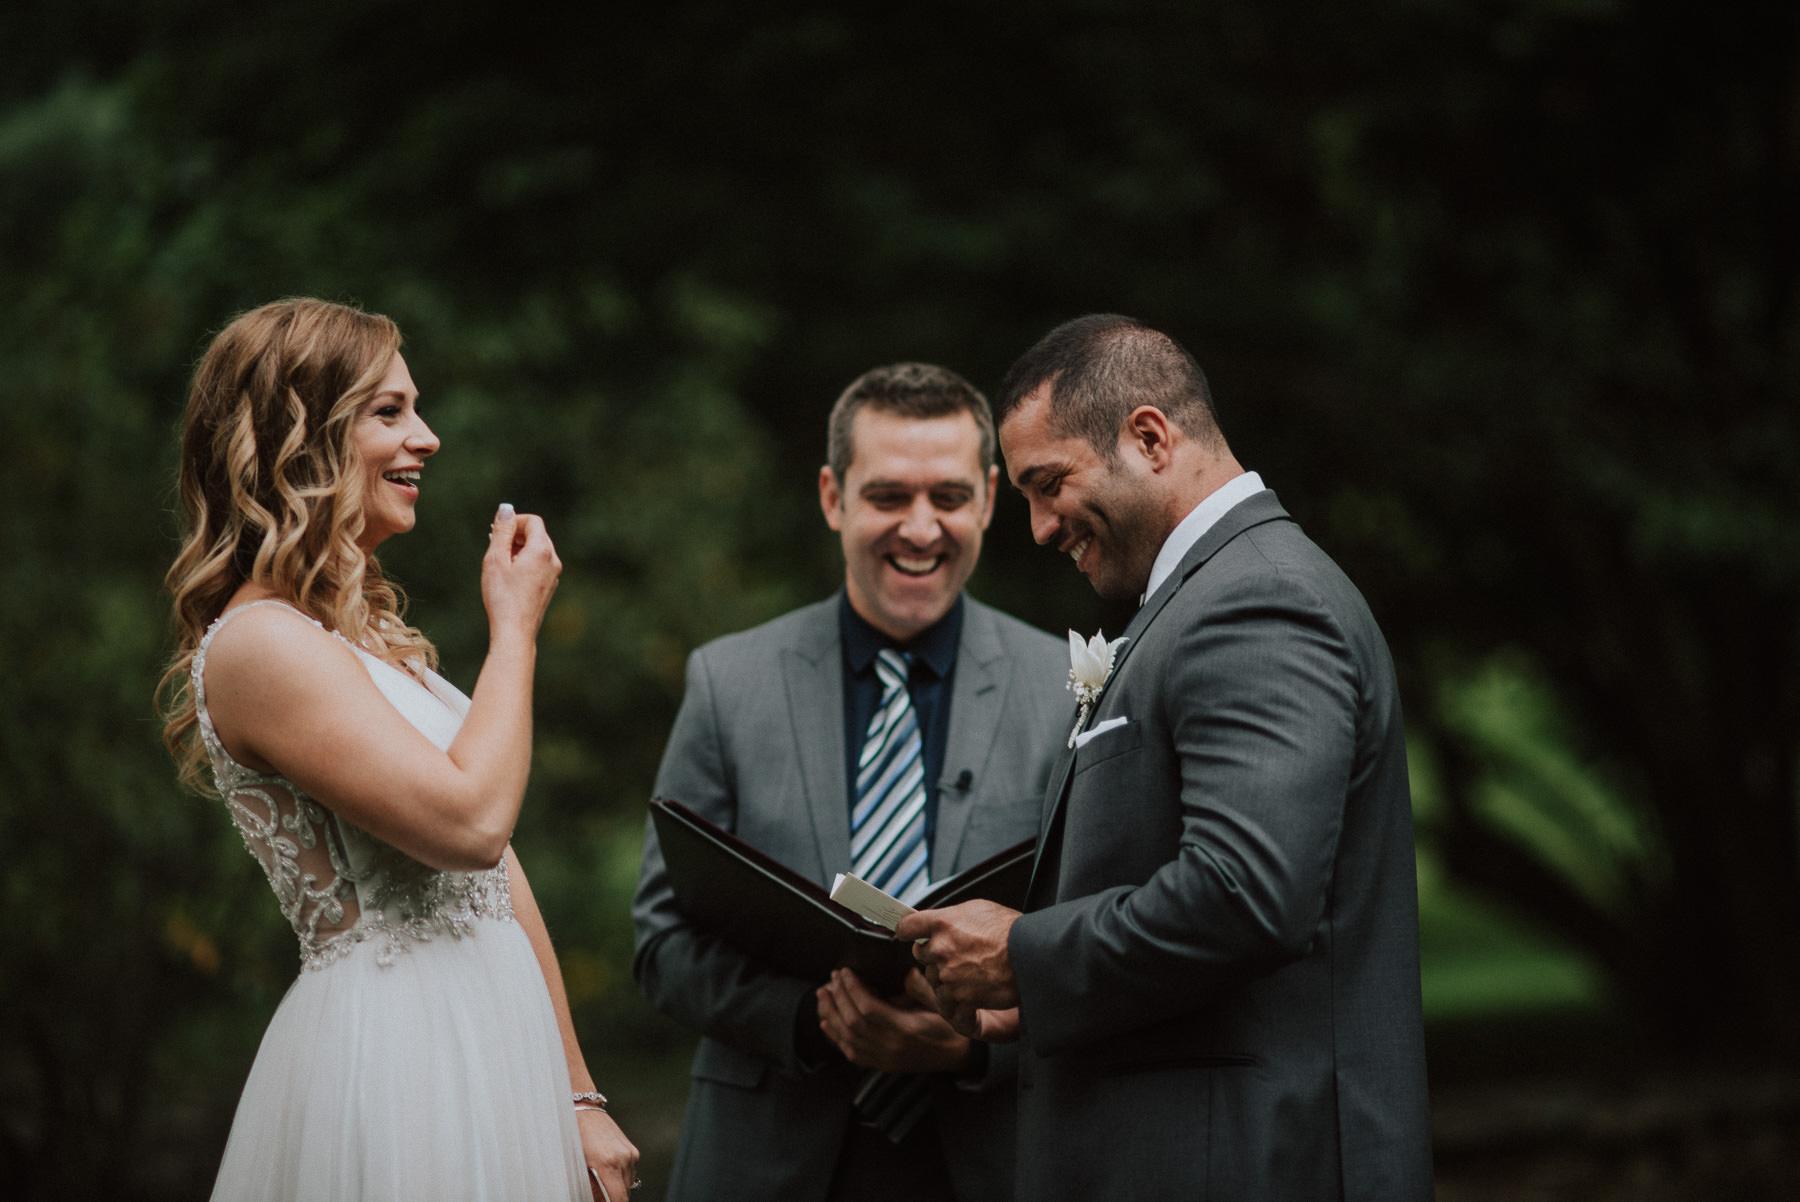 appleford-estate-wedding-photography-61.jpg